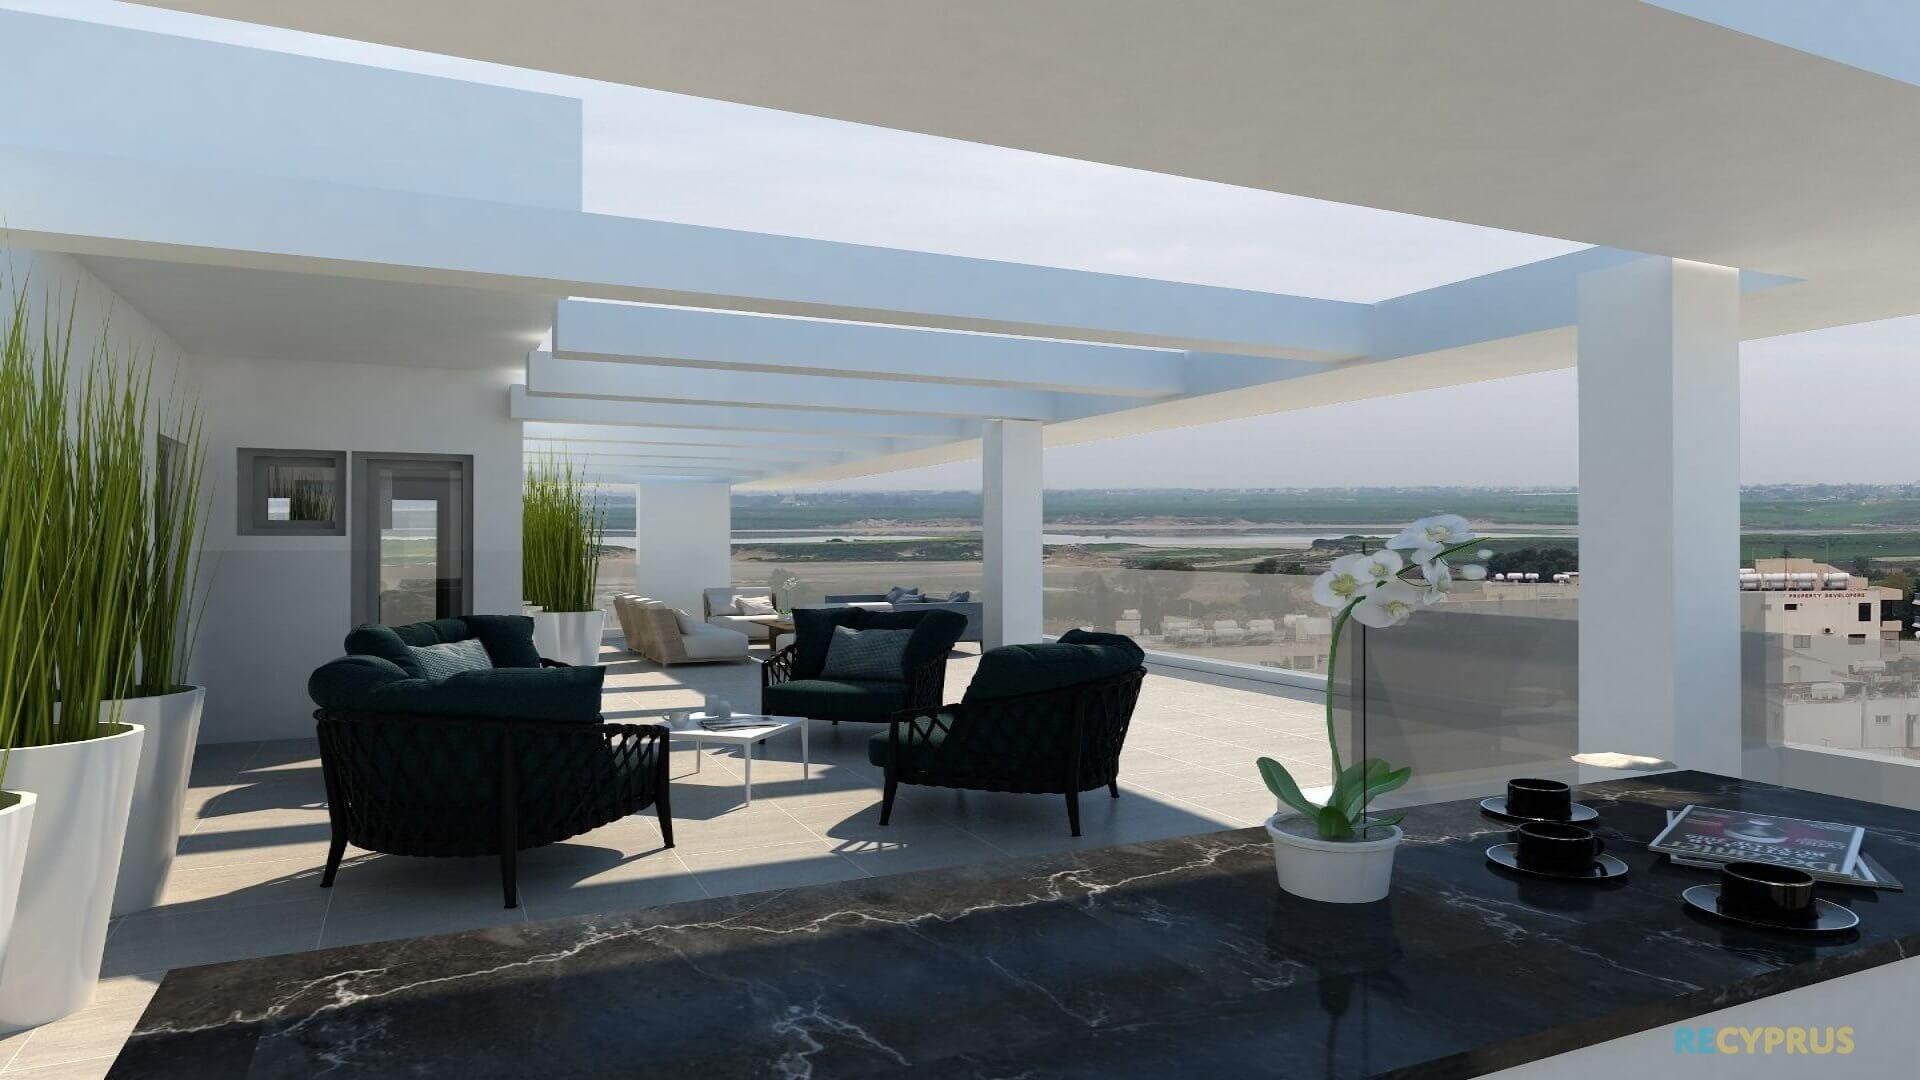 Apartment for sale City Center Larnaca Cyprus 3 3601